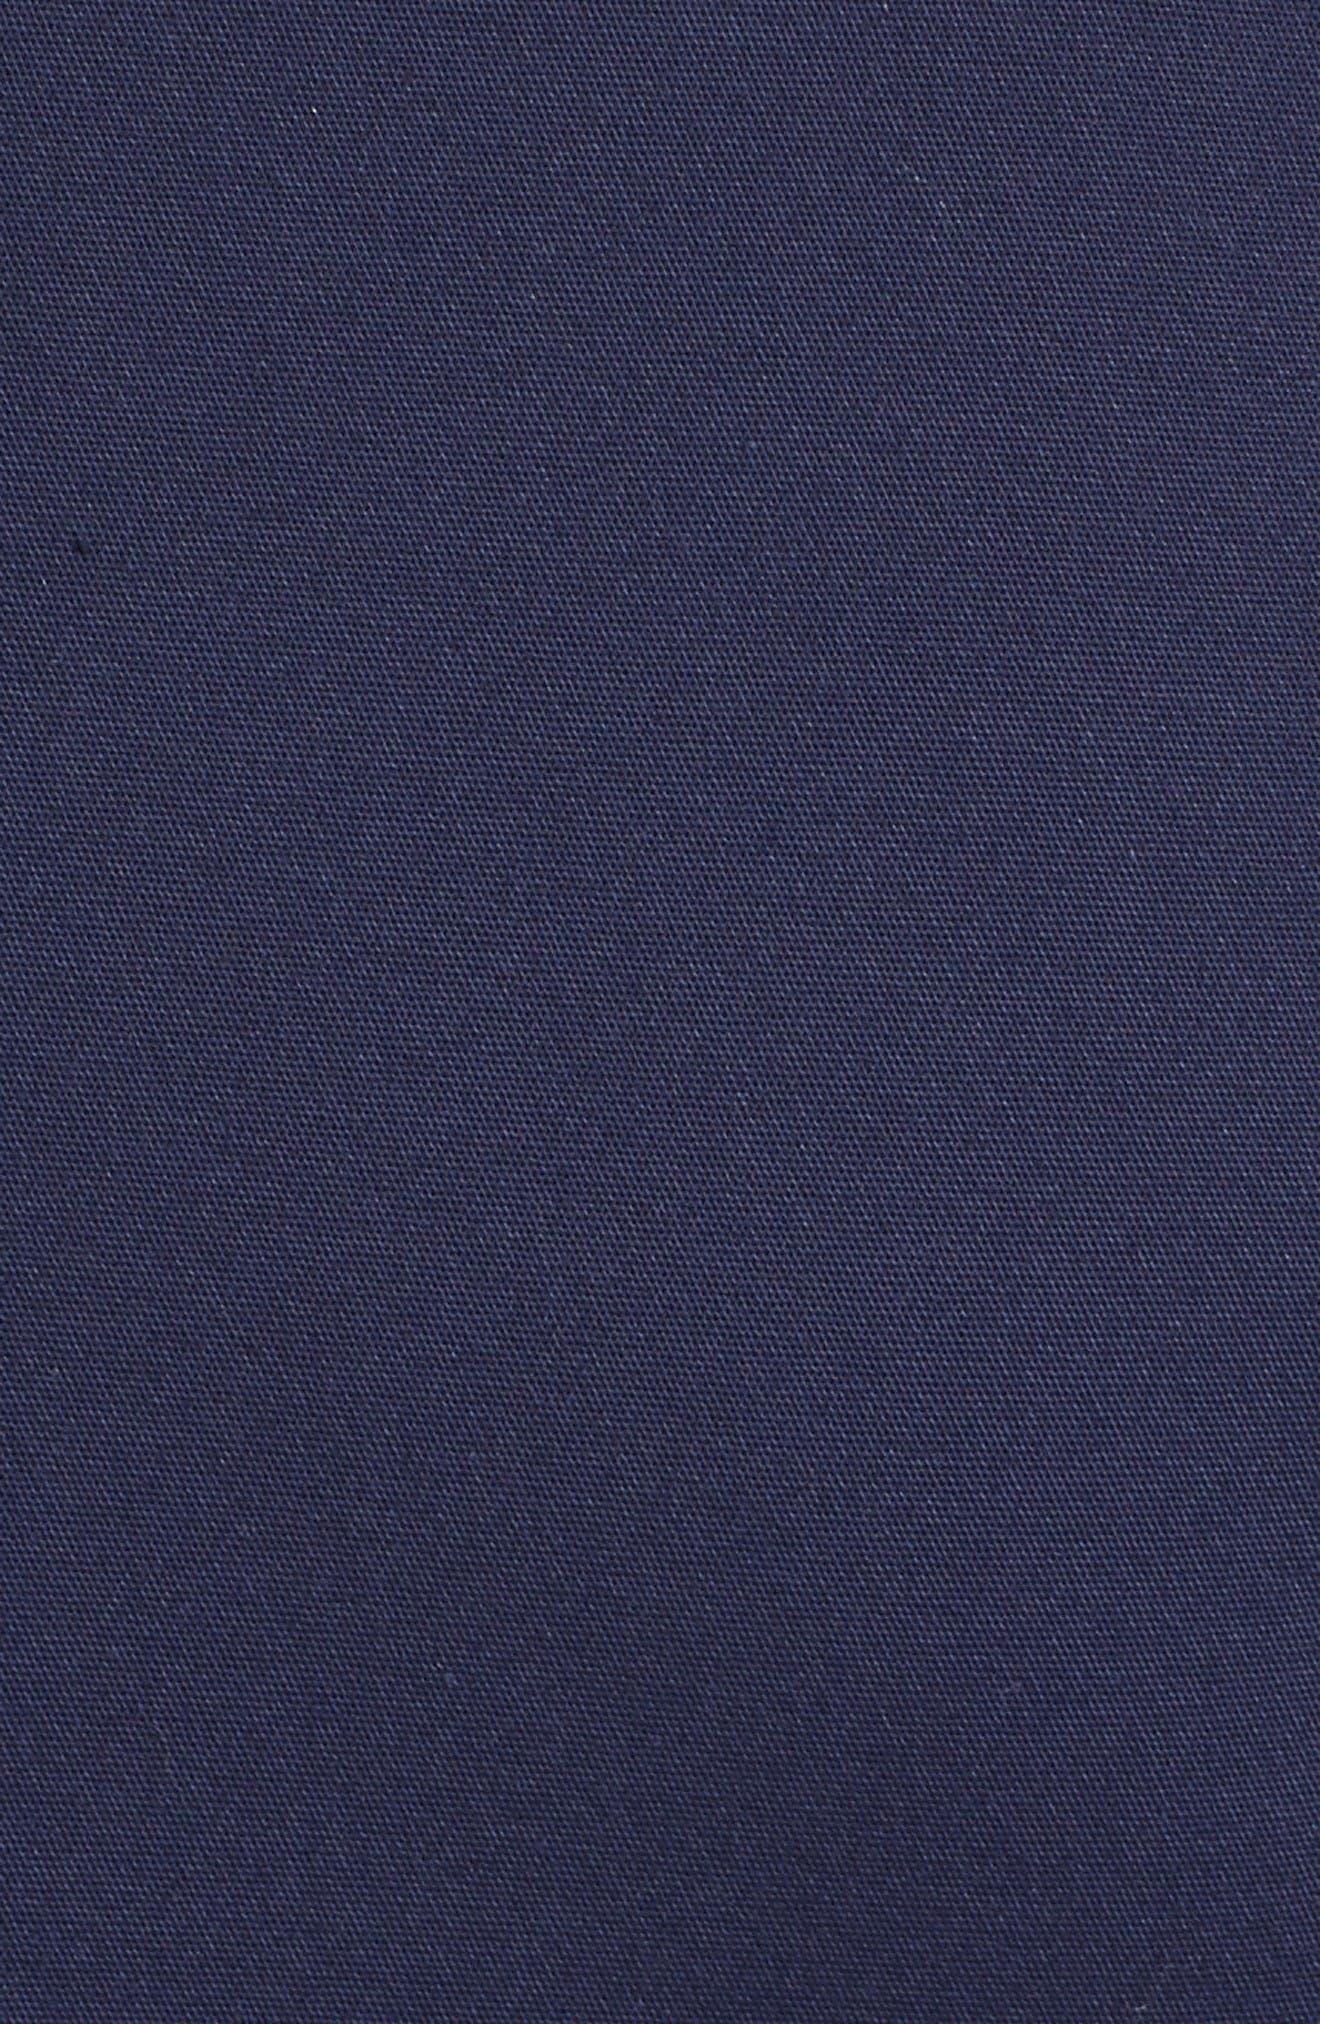 Cotton Blend Sheath Dress,                             Alternate thumbnail 3, color,                             Navy